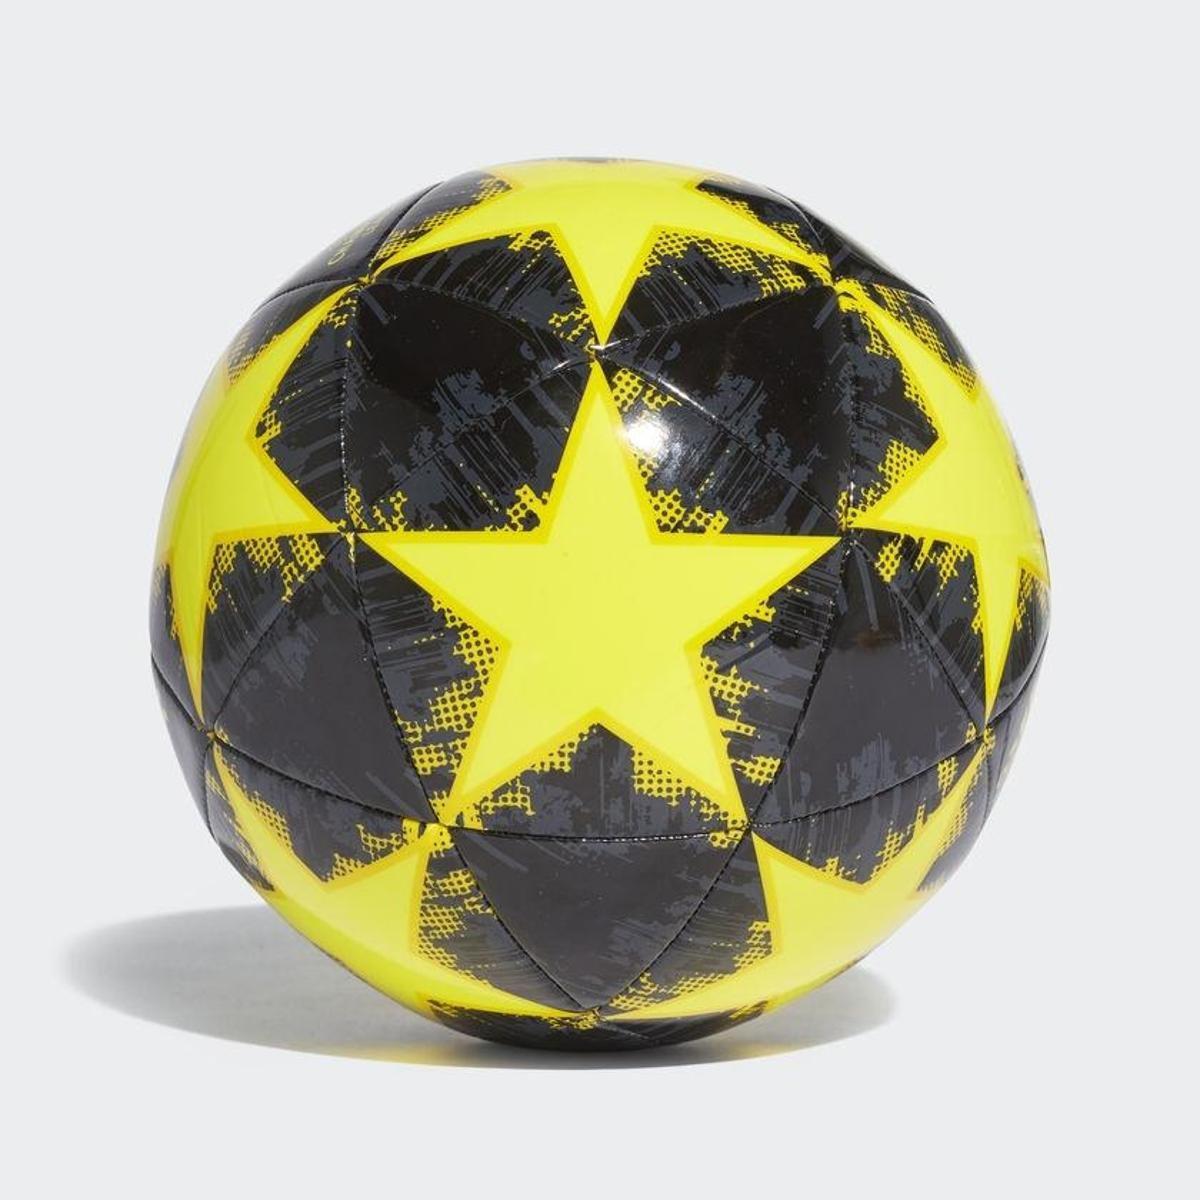 02de96c1ca ... Bola de Futebol Campo Juventus Adidas Capitano Finale 18 UCL ...